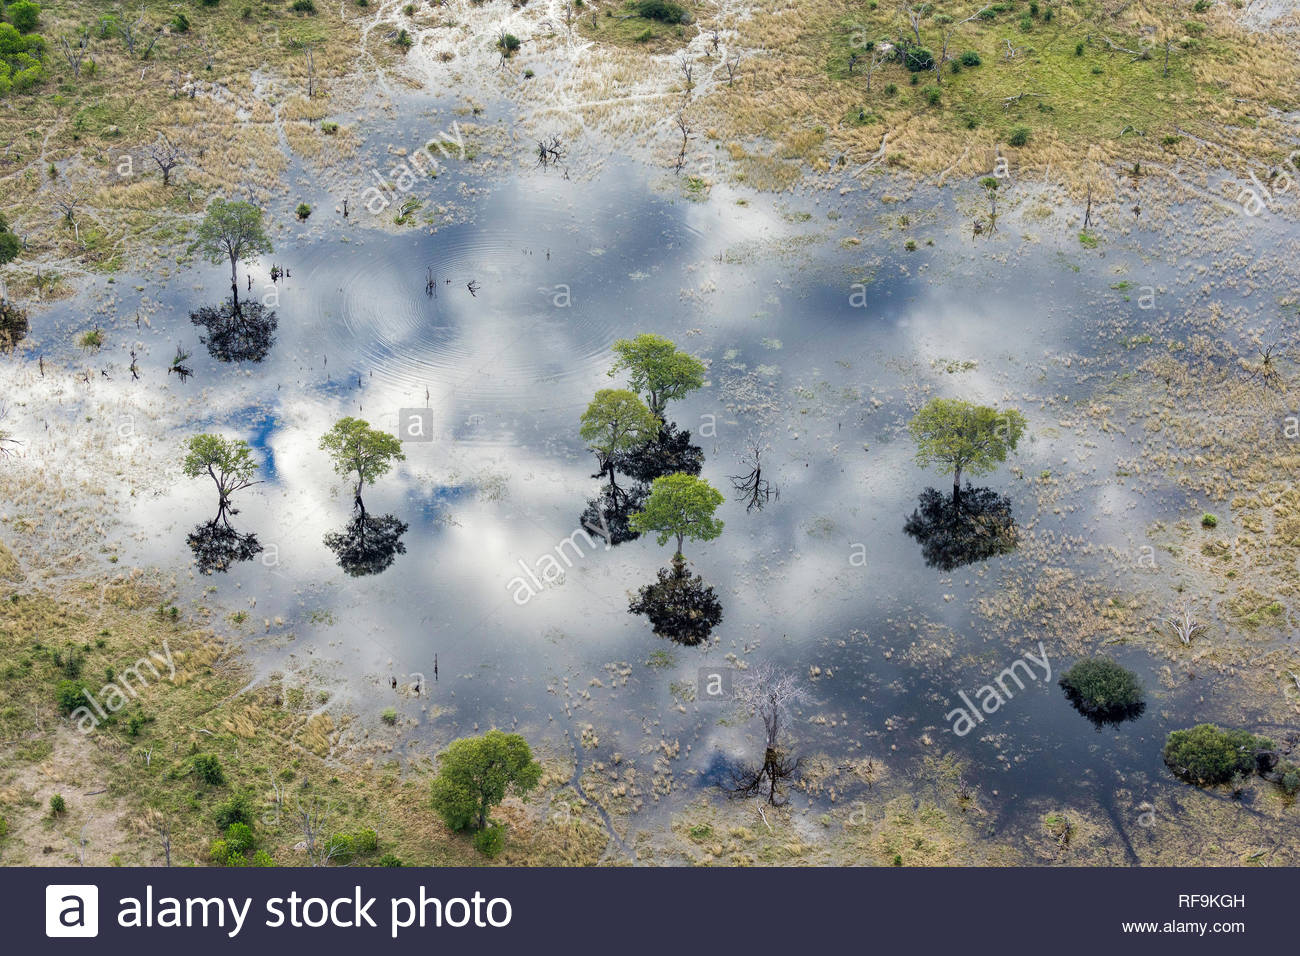 Aerial view of Khwai River, Okavango Delta, Botswana, Africa - Stock Image